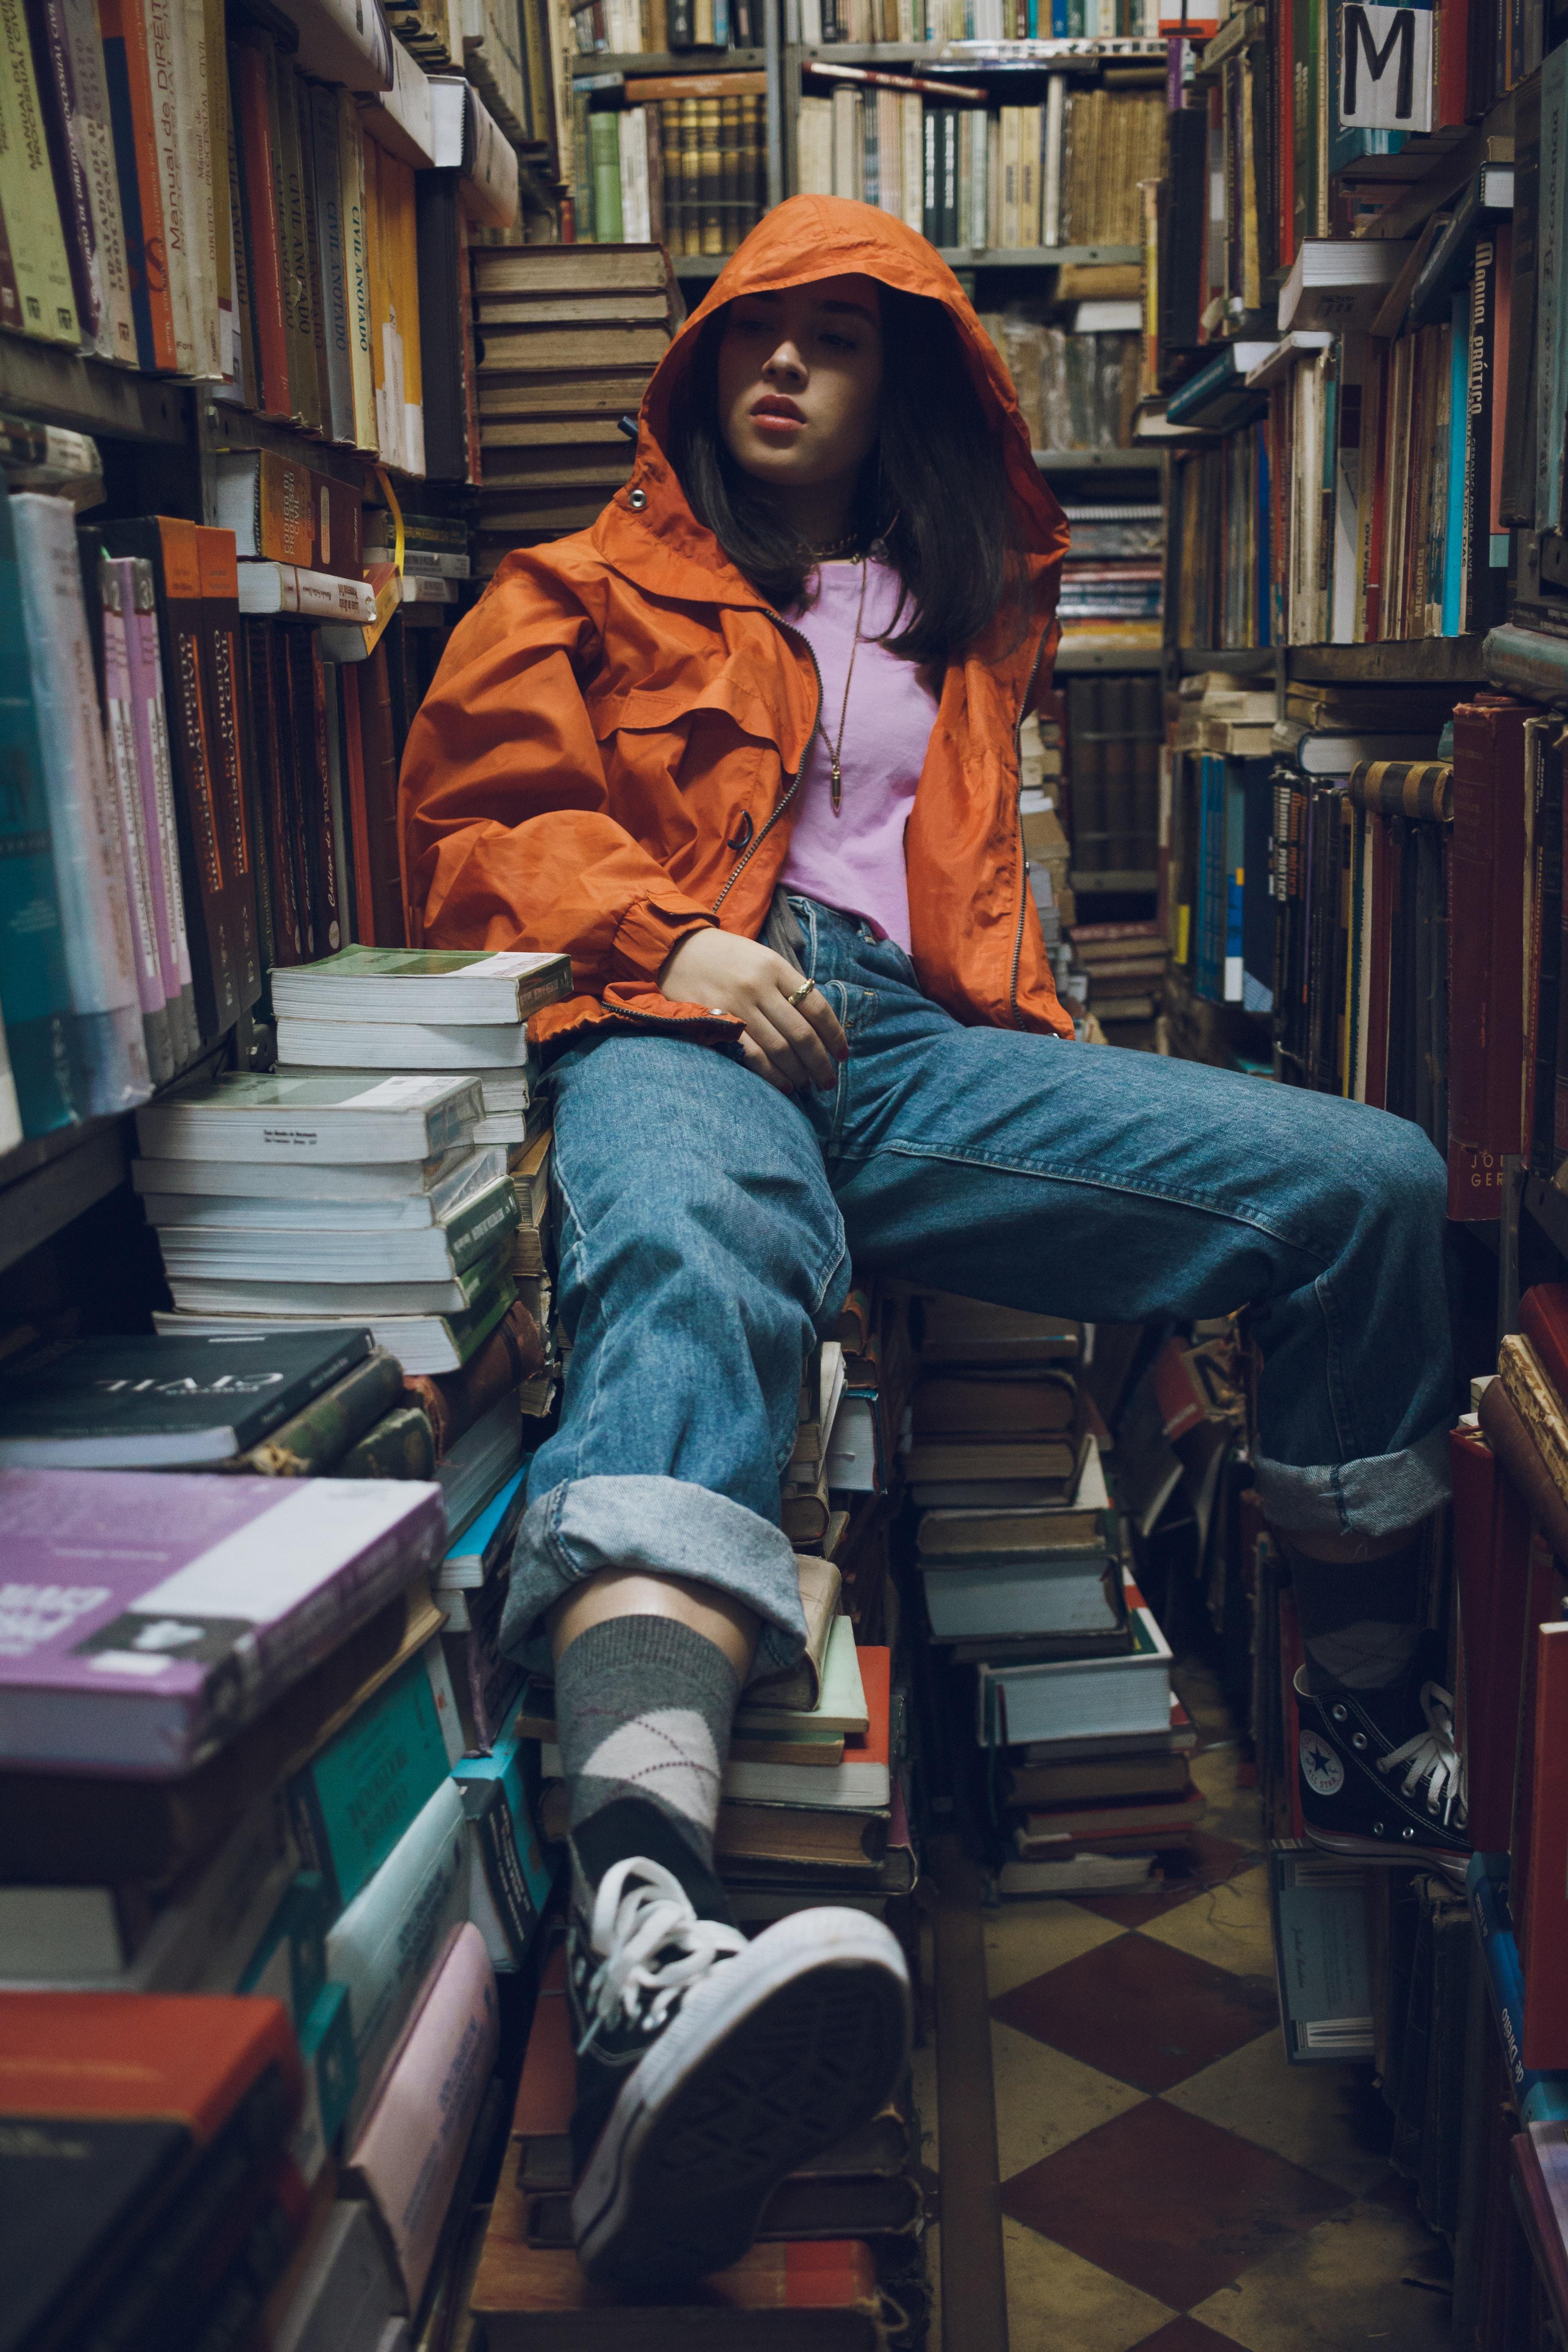 adolescent-book-series-bookcase-1854016.jpg